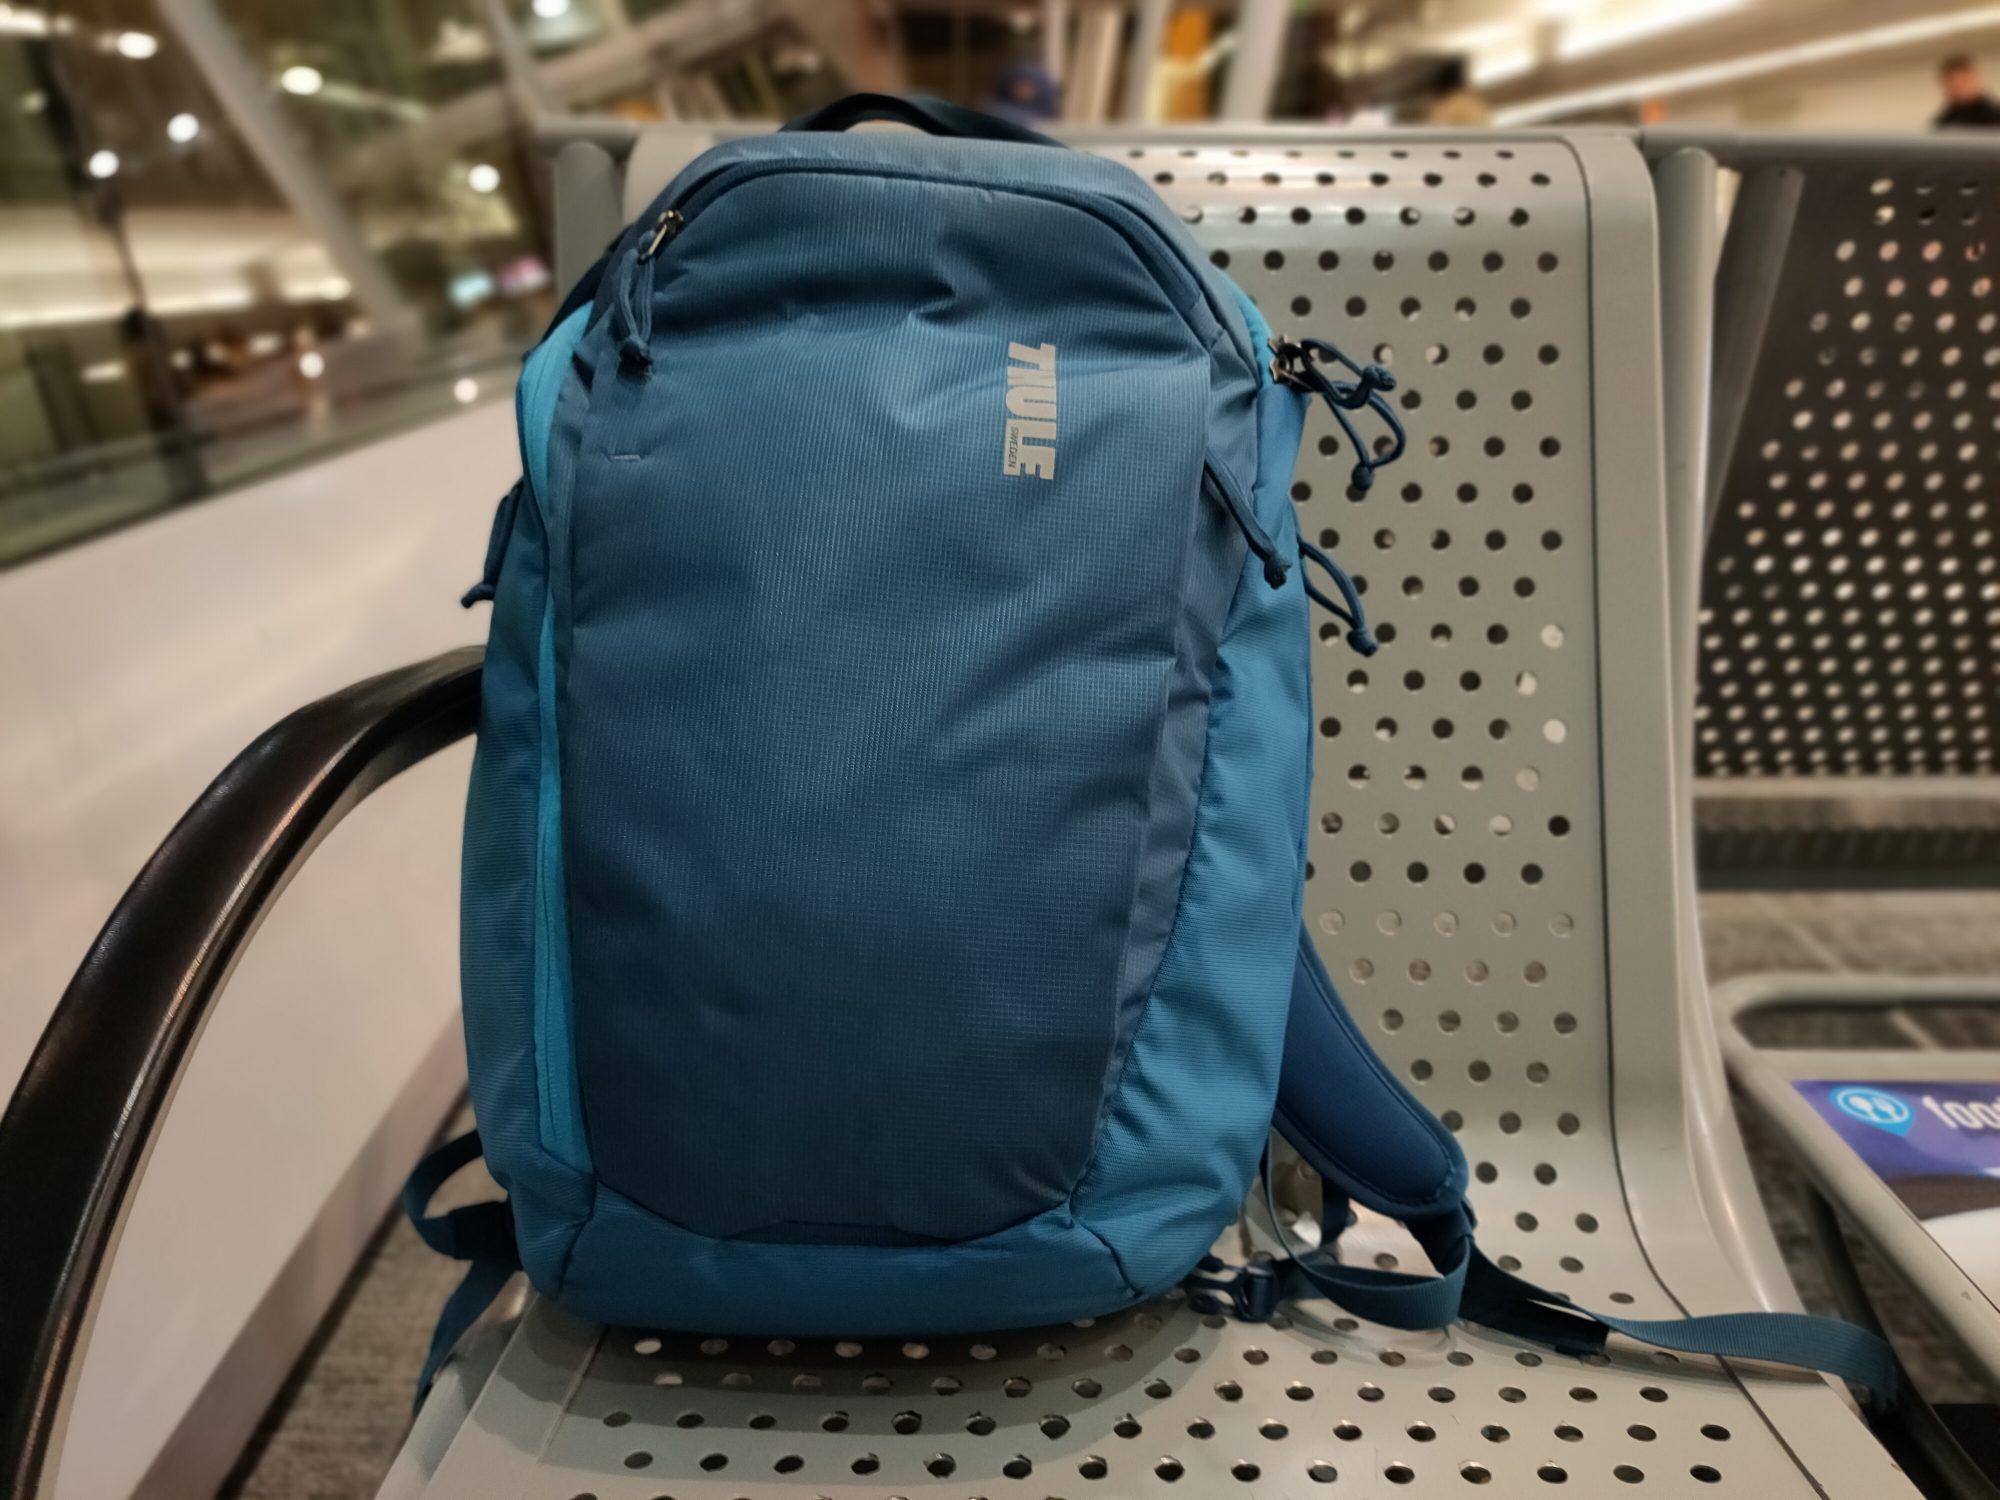 Thule EnRoute 23L - miejski plecak, który teraz kupisz o 57% taniej (opinia) 22